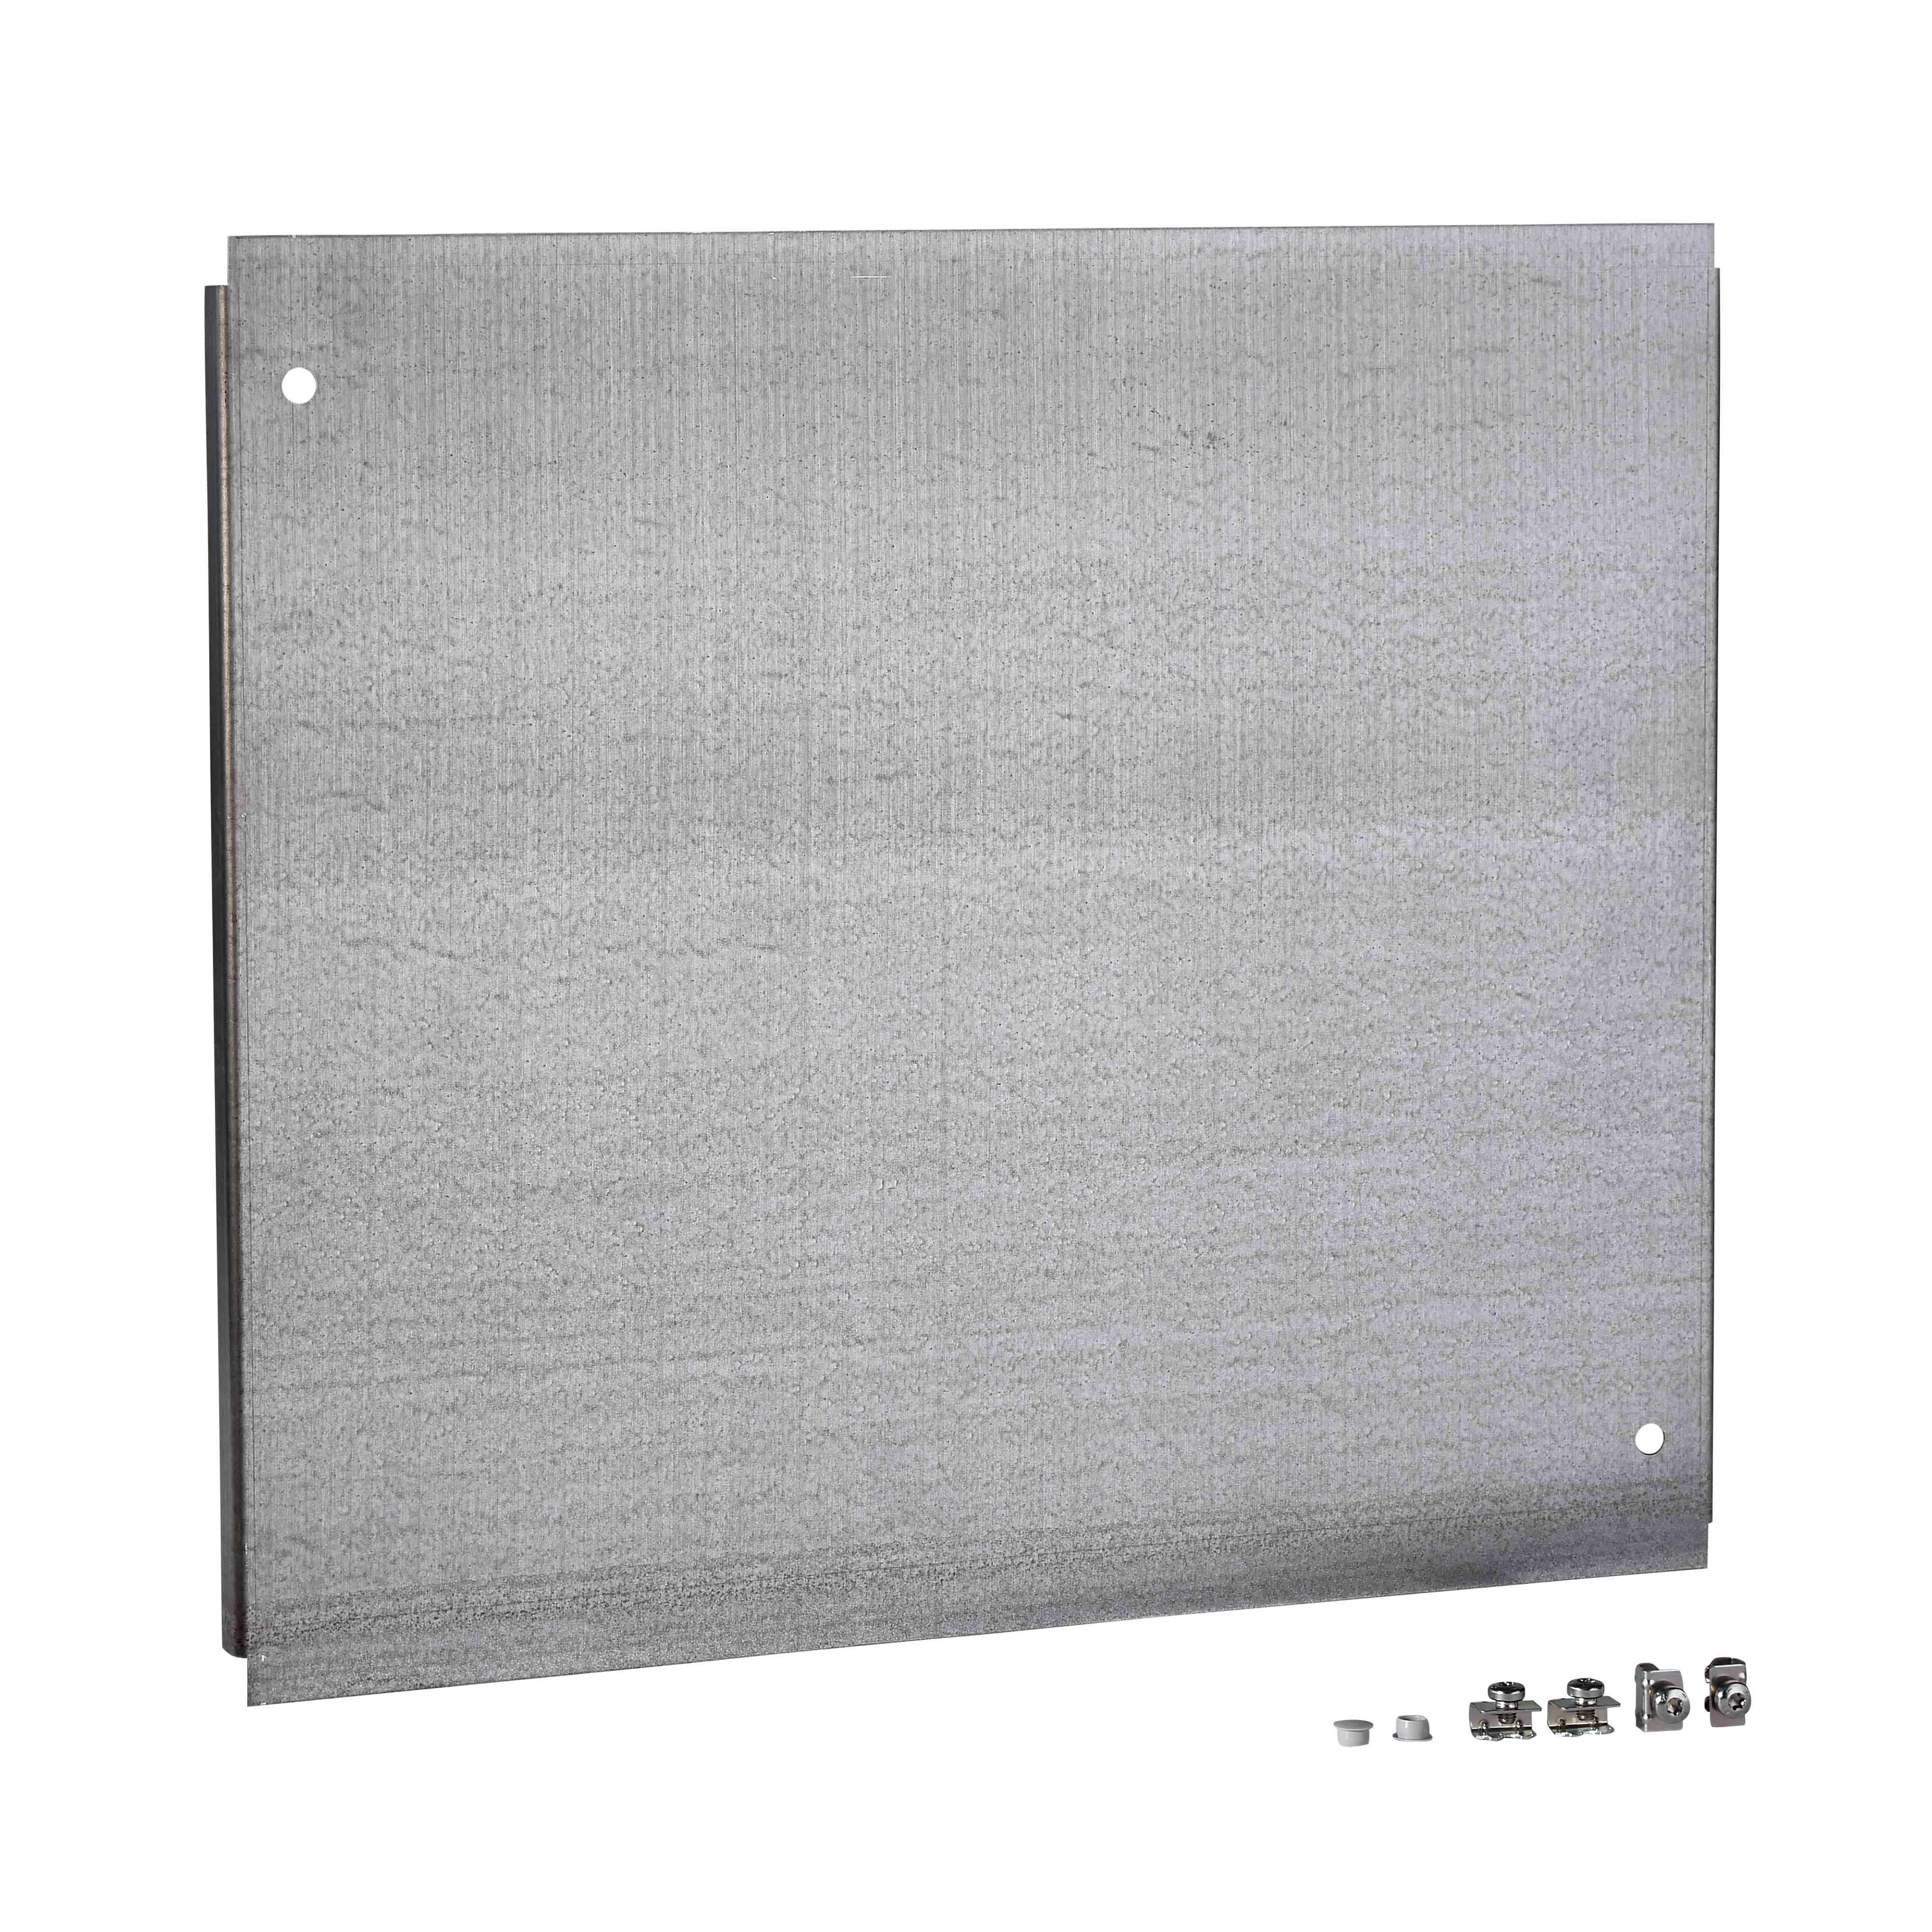 Spacial SF navadna plošča kab. uvodnice - pritr. s sponkami - 1200 x 600 mm